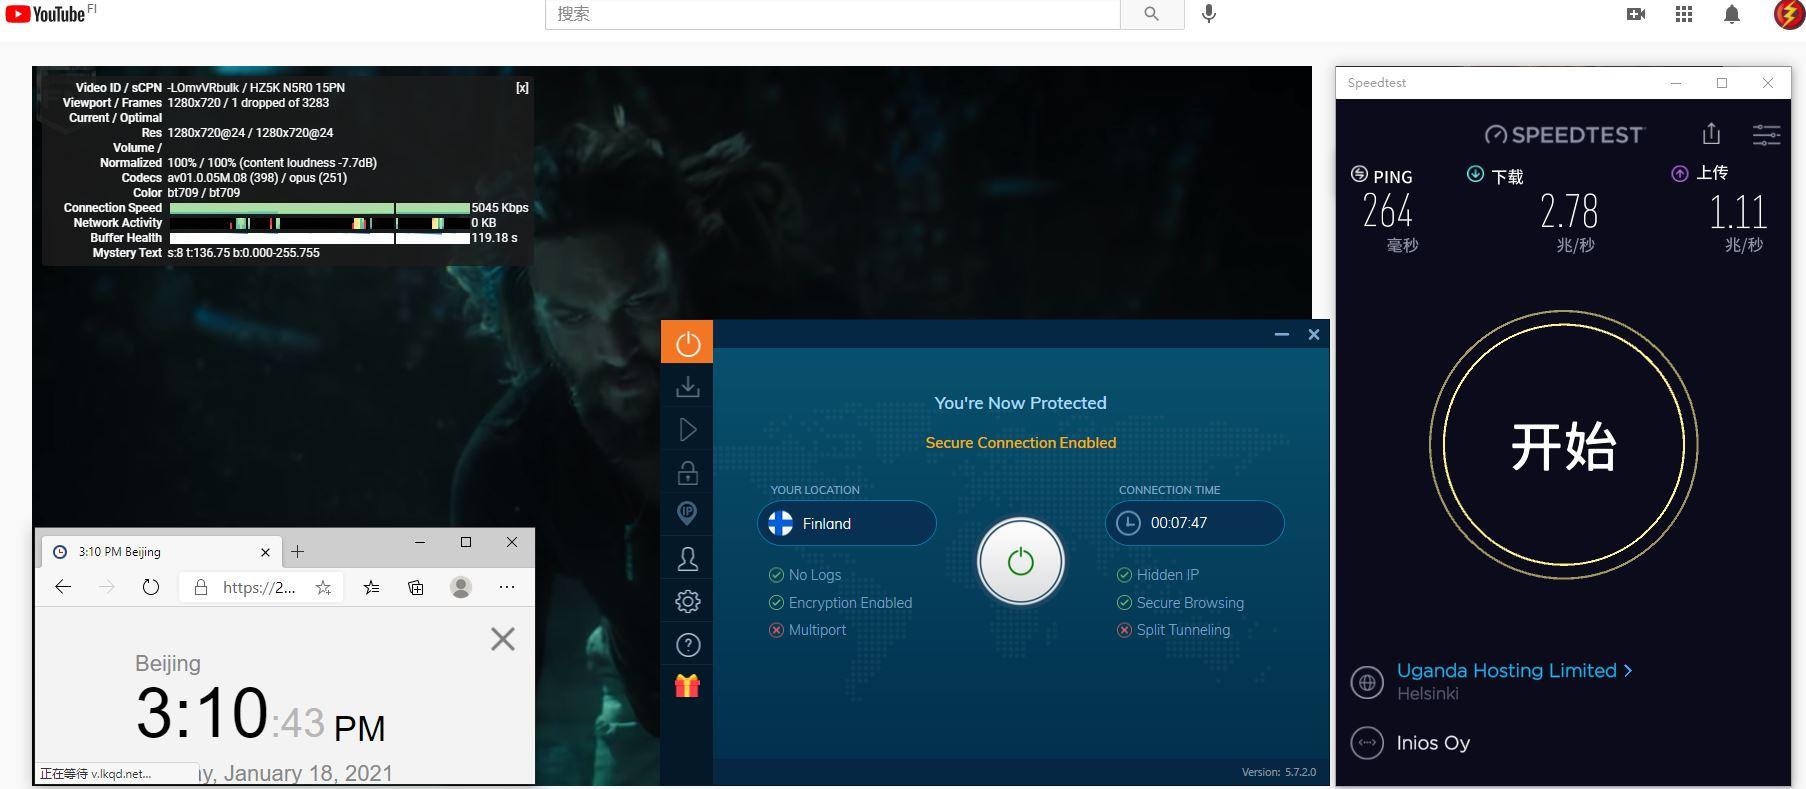 Windows10 IvacyVPN IKEv2 Finland 服务器 中国VPN 翻墙 科学上网 10BEASTS Barry测试 - 20210118